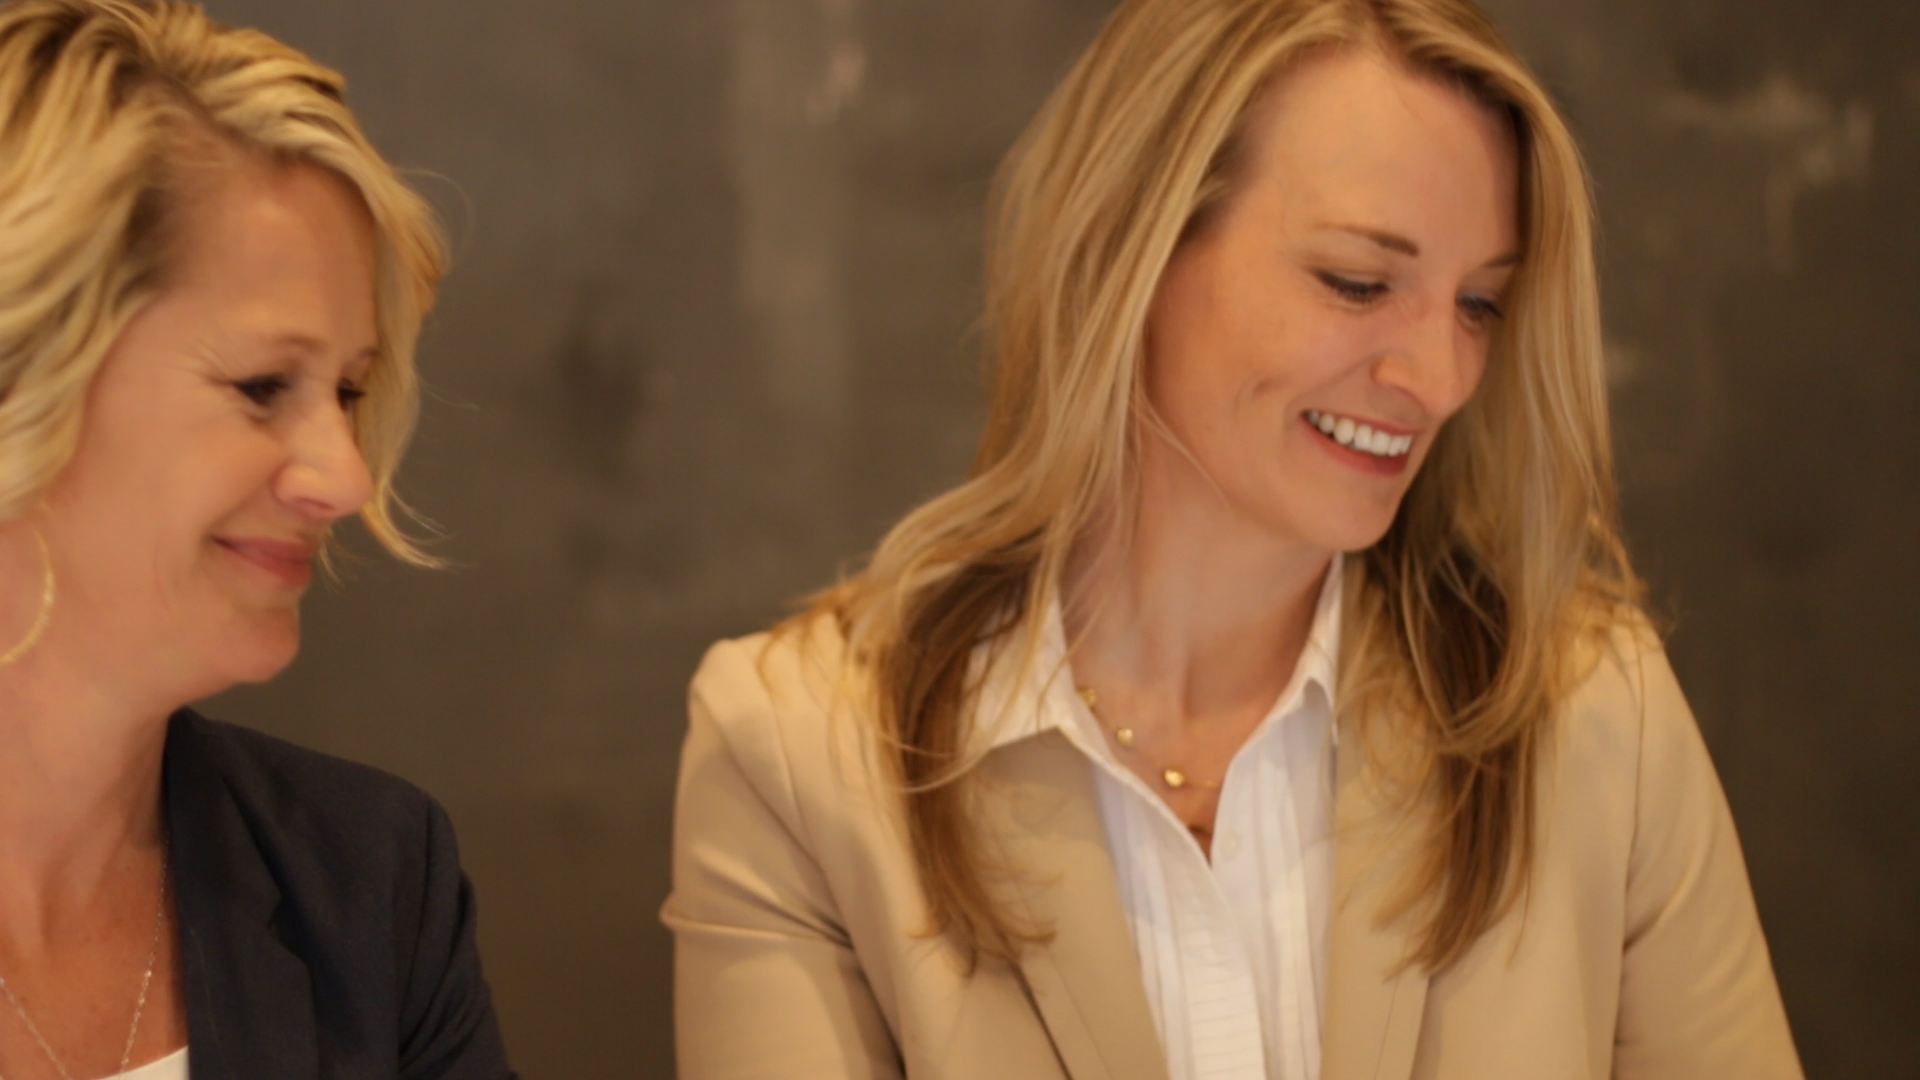 Kristin Carroll & Jillian Schmitt, Co-Founders of Survivorship Solutions